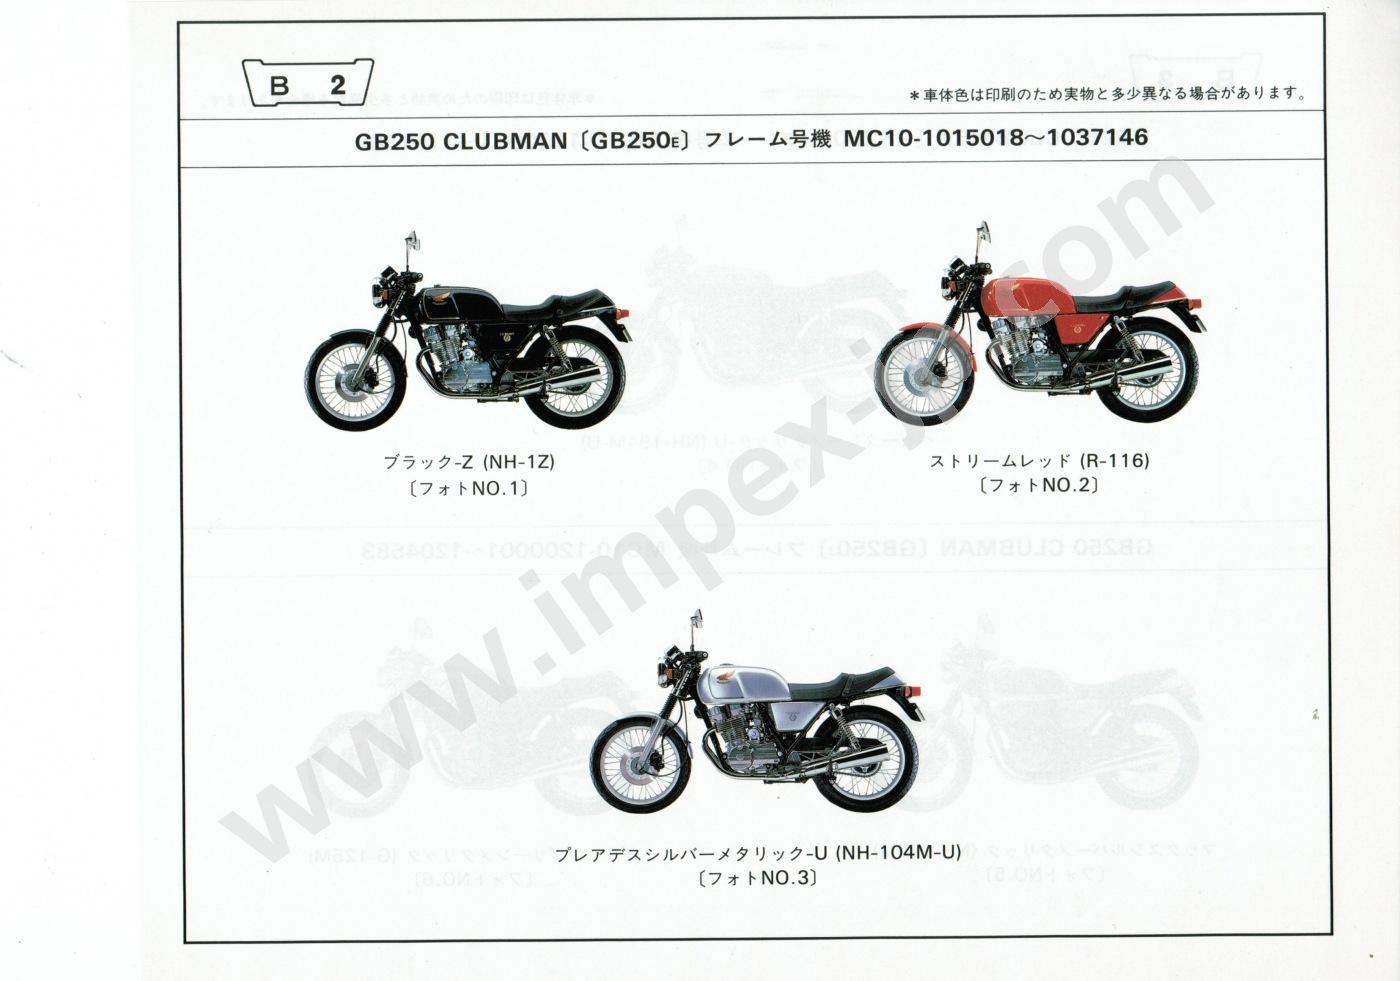 Motorcycle Parts Honda Gb250 Clubman Mc10 101 110 120 130 135 140 150 160 170 Impex Japan